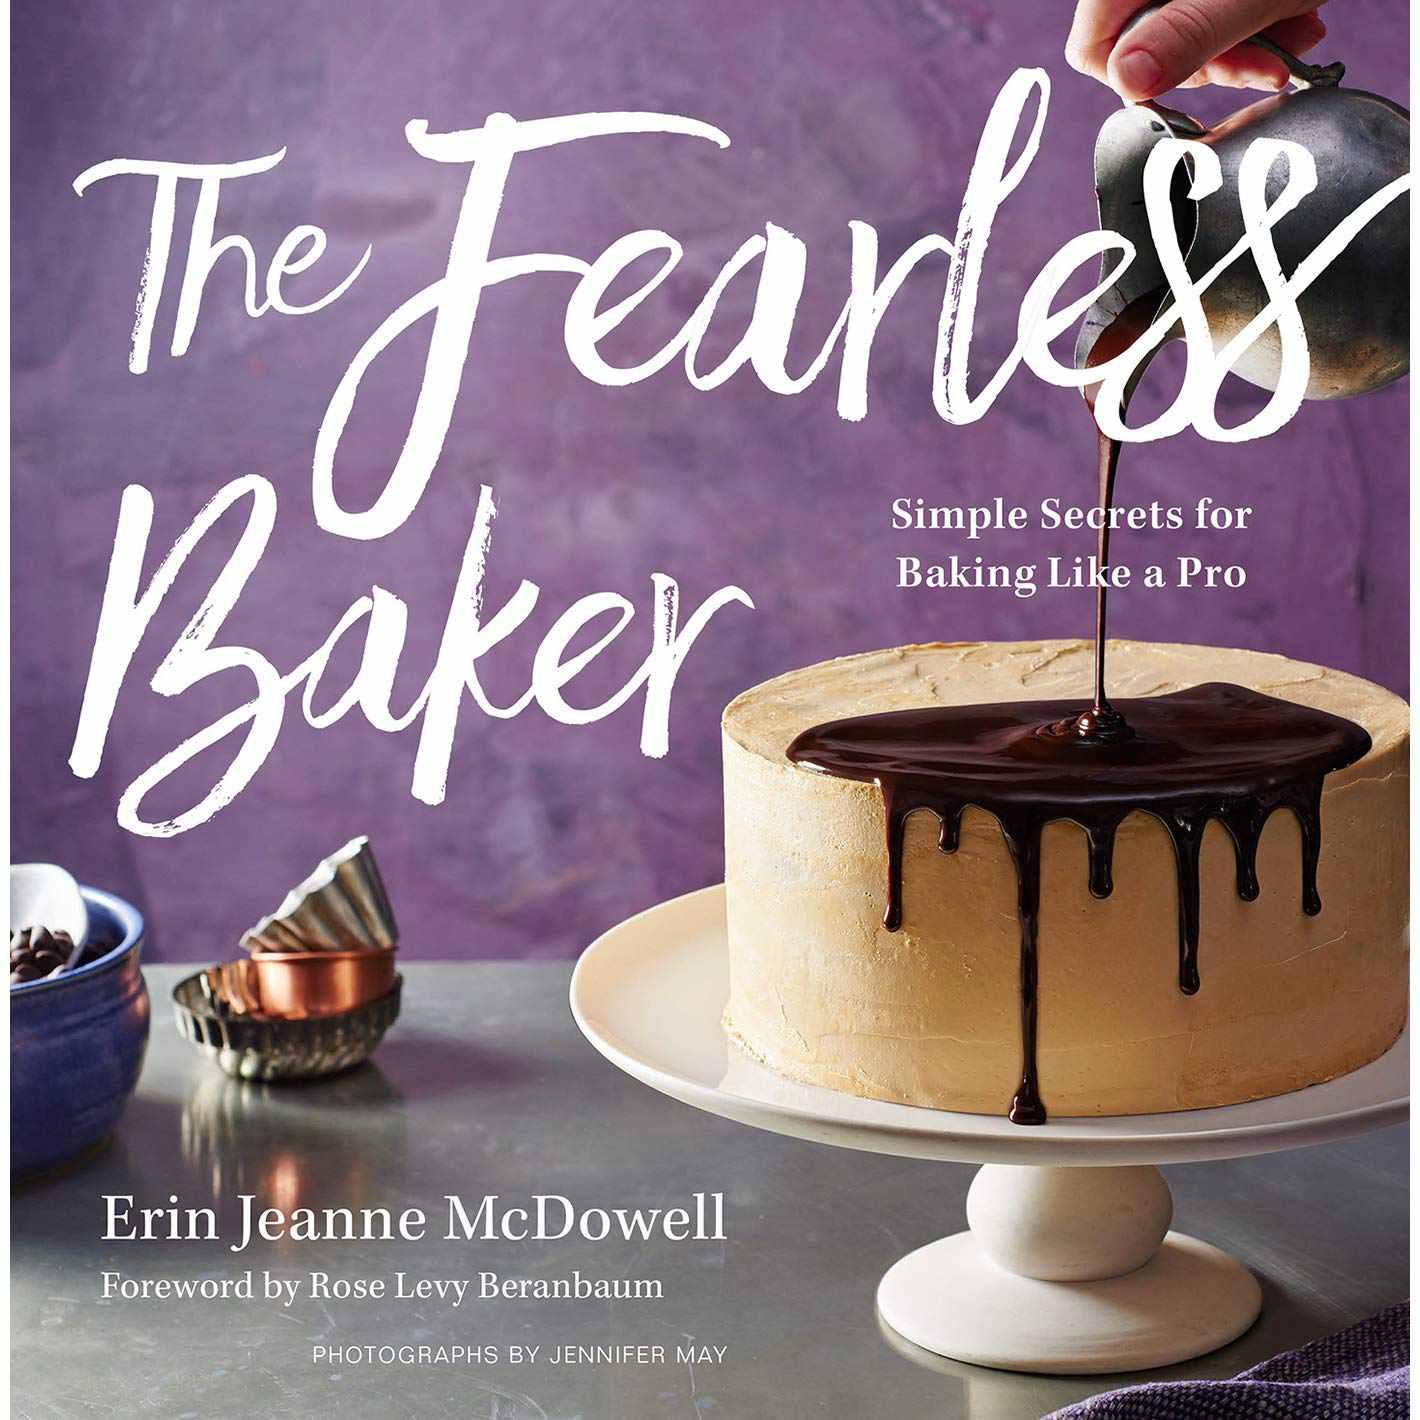 The Fearless Baker—best baking books